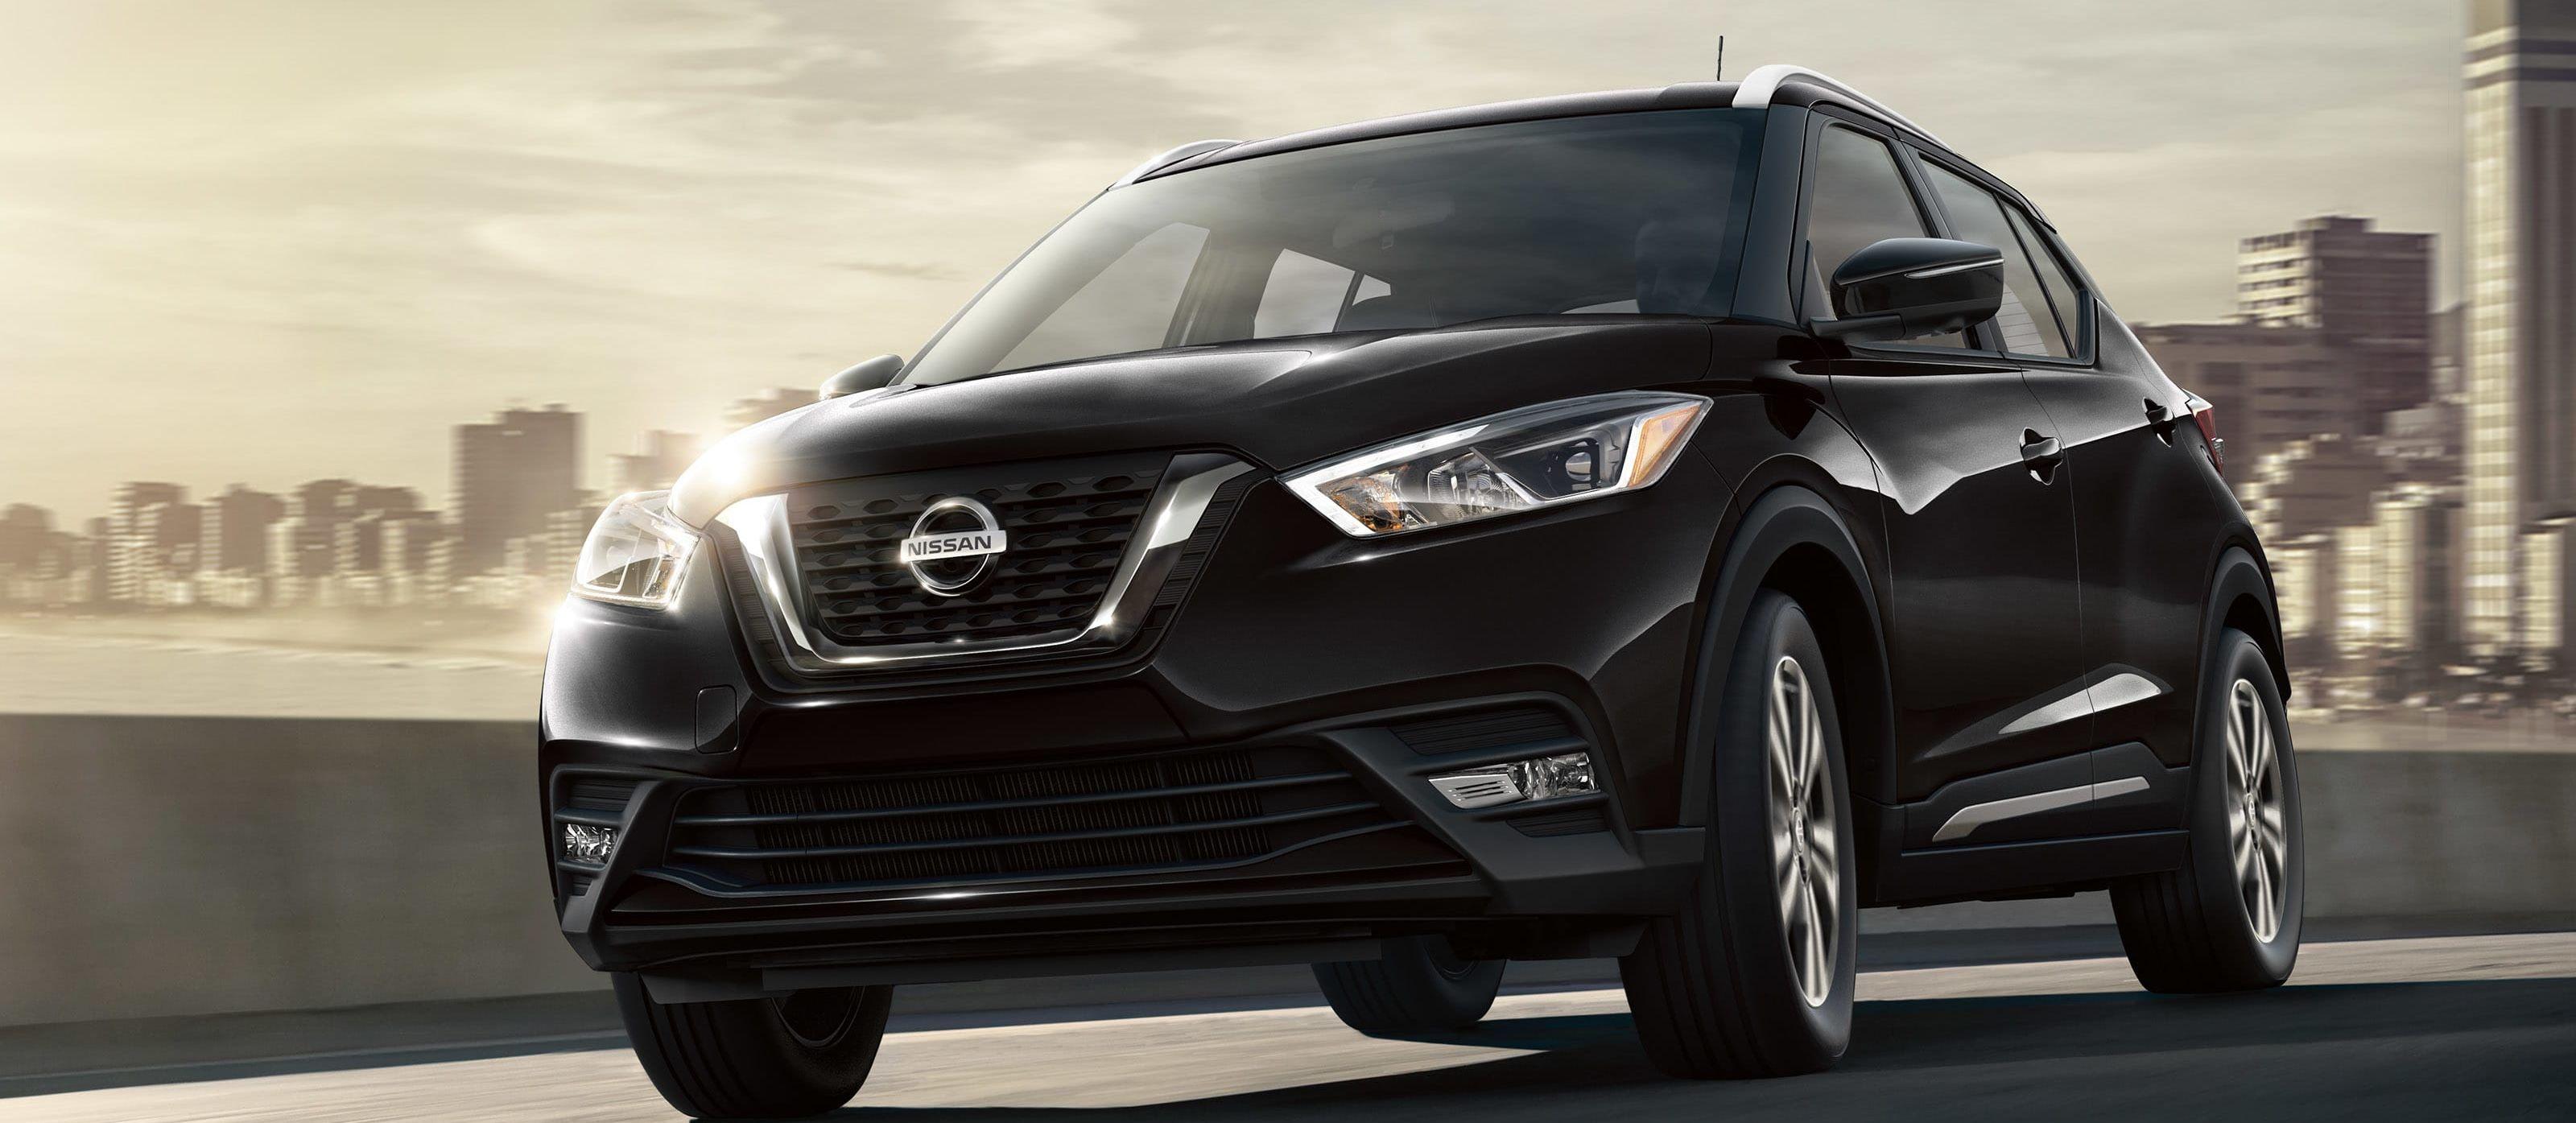 2019 Nissan Kicks Leasing near Springfield, VA